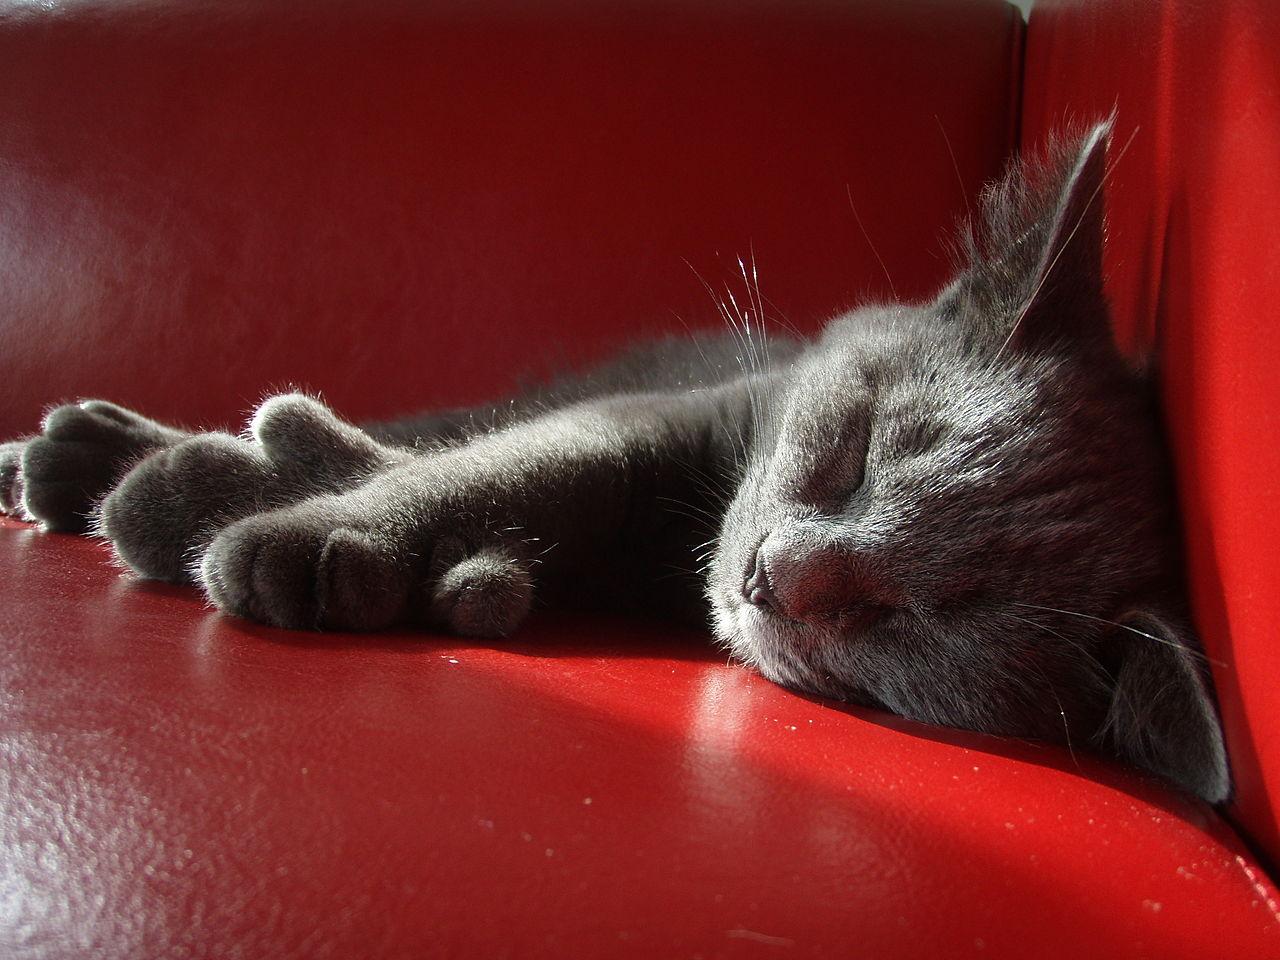 Дымчатые котята, кошки и коты скоттиш-фолд и страйт